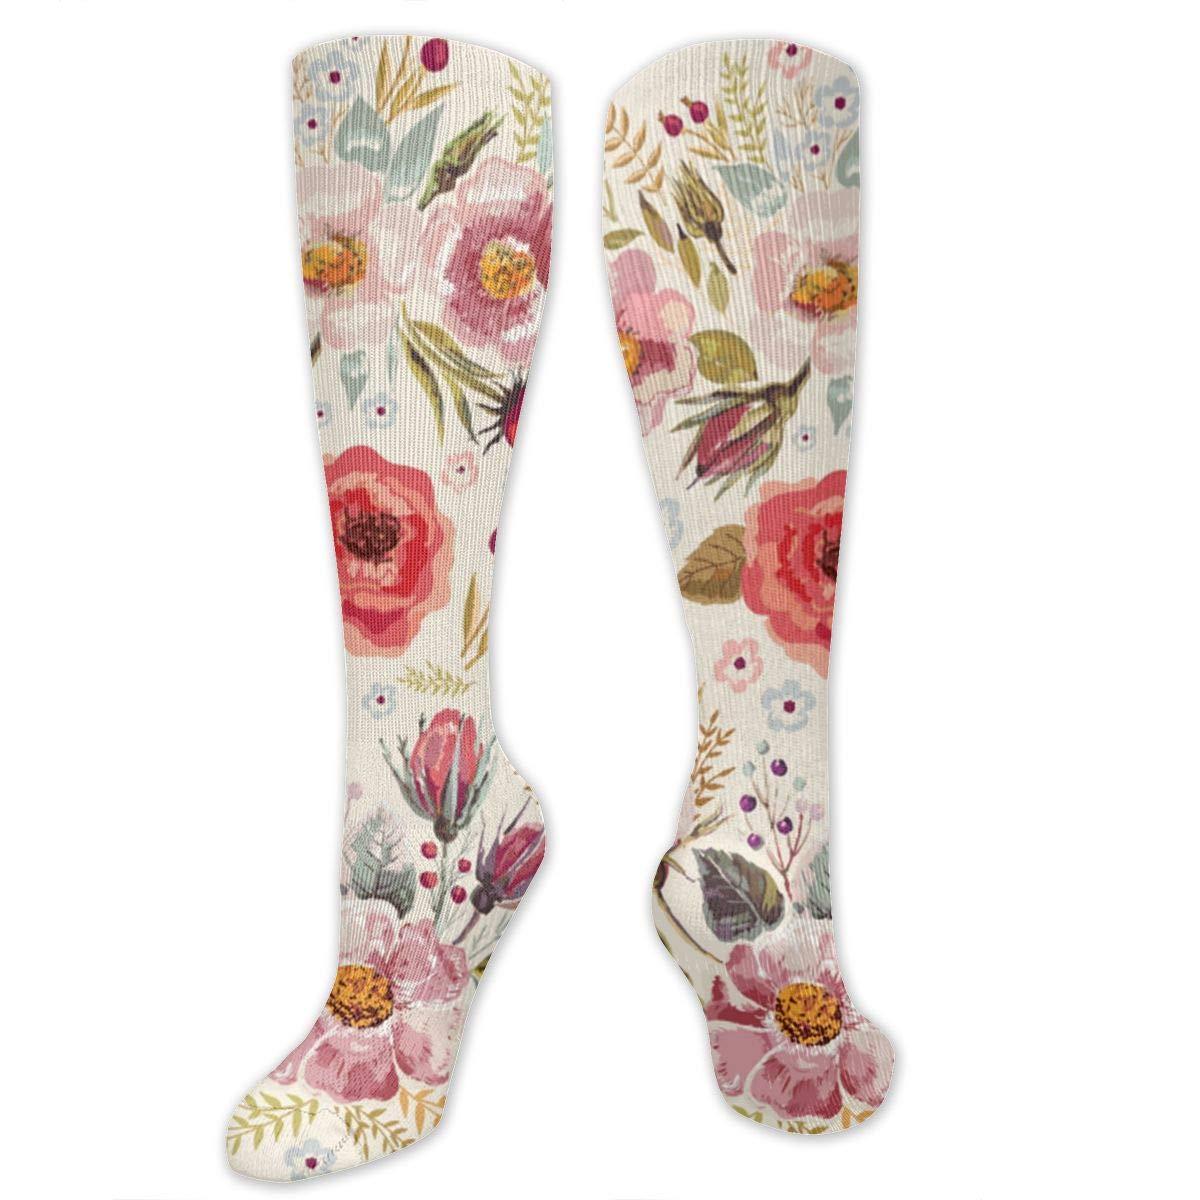 Men Multicolored Pattern Fashionable Fun Crew Cotton Socks Chanwazibibiliu White Tail Shape Mens Colorful Dress Socks Funky